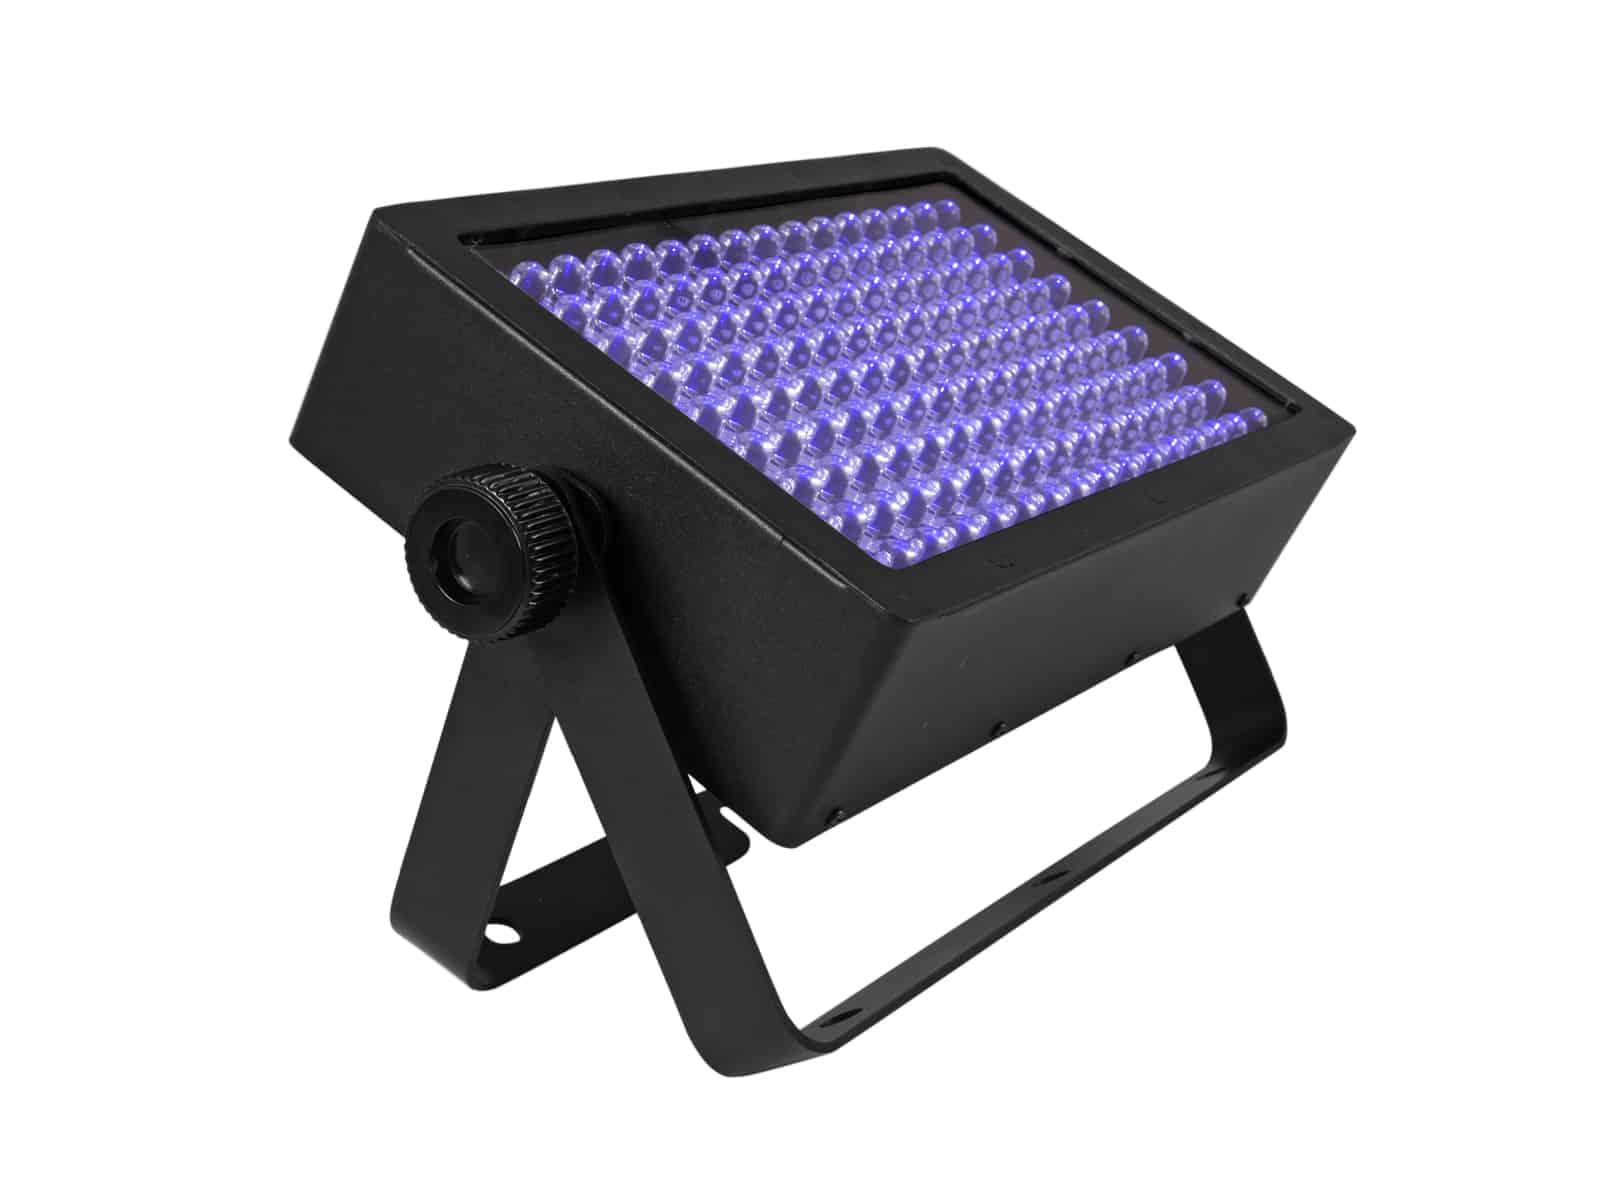 EUROLITE LED FLD-144 UV 10mm Flood, Eurolite uv lampe, uv lampe, uv lamper, uv lys, led uv